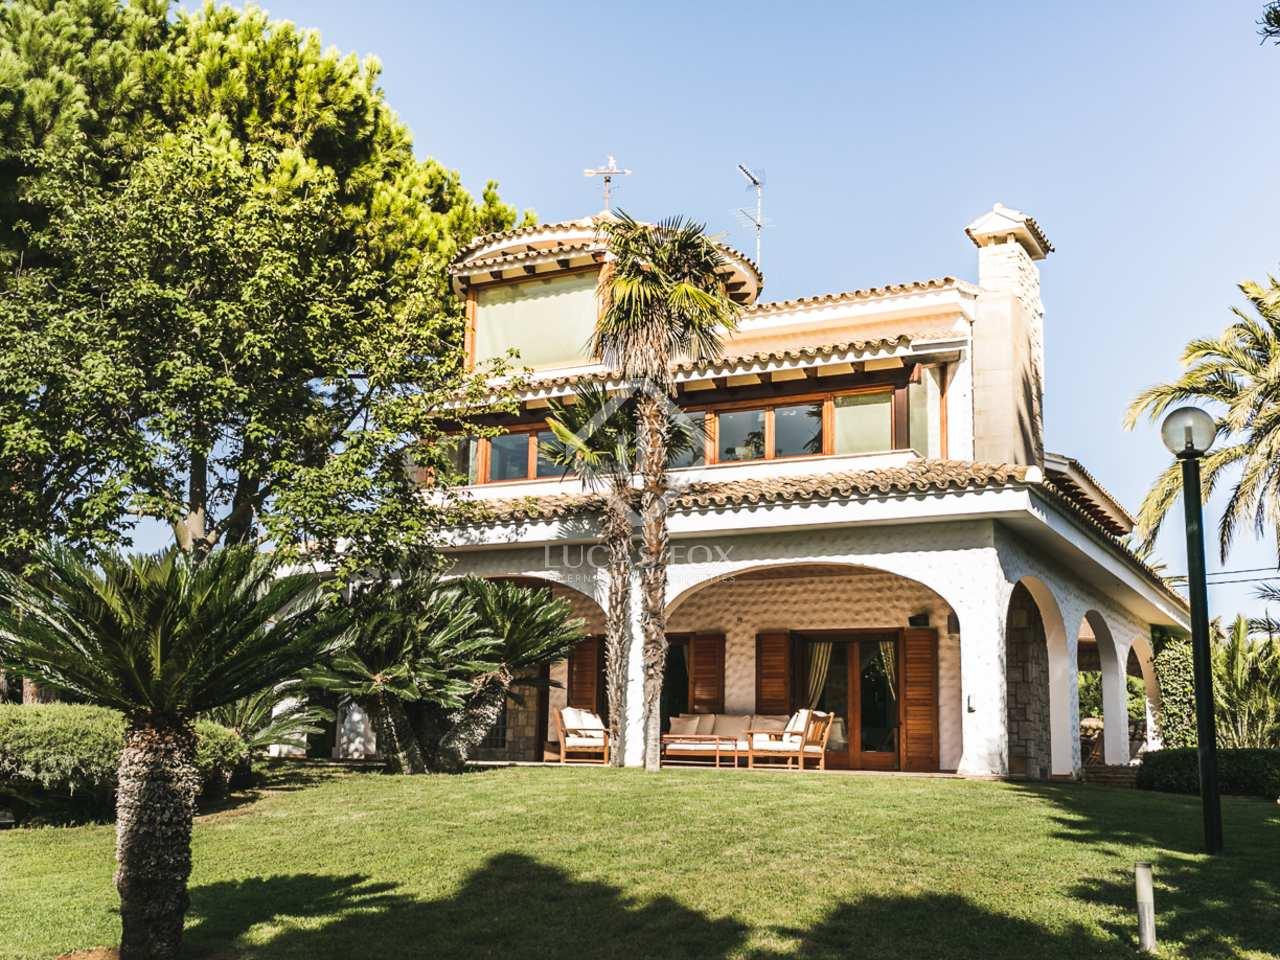 Luxury villa with pool for sale in el planti valencia for Villas valencia